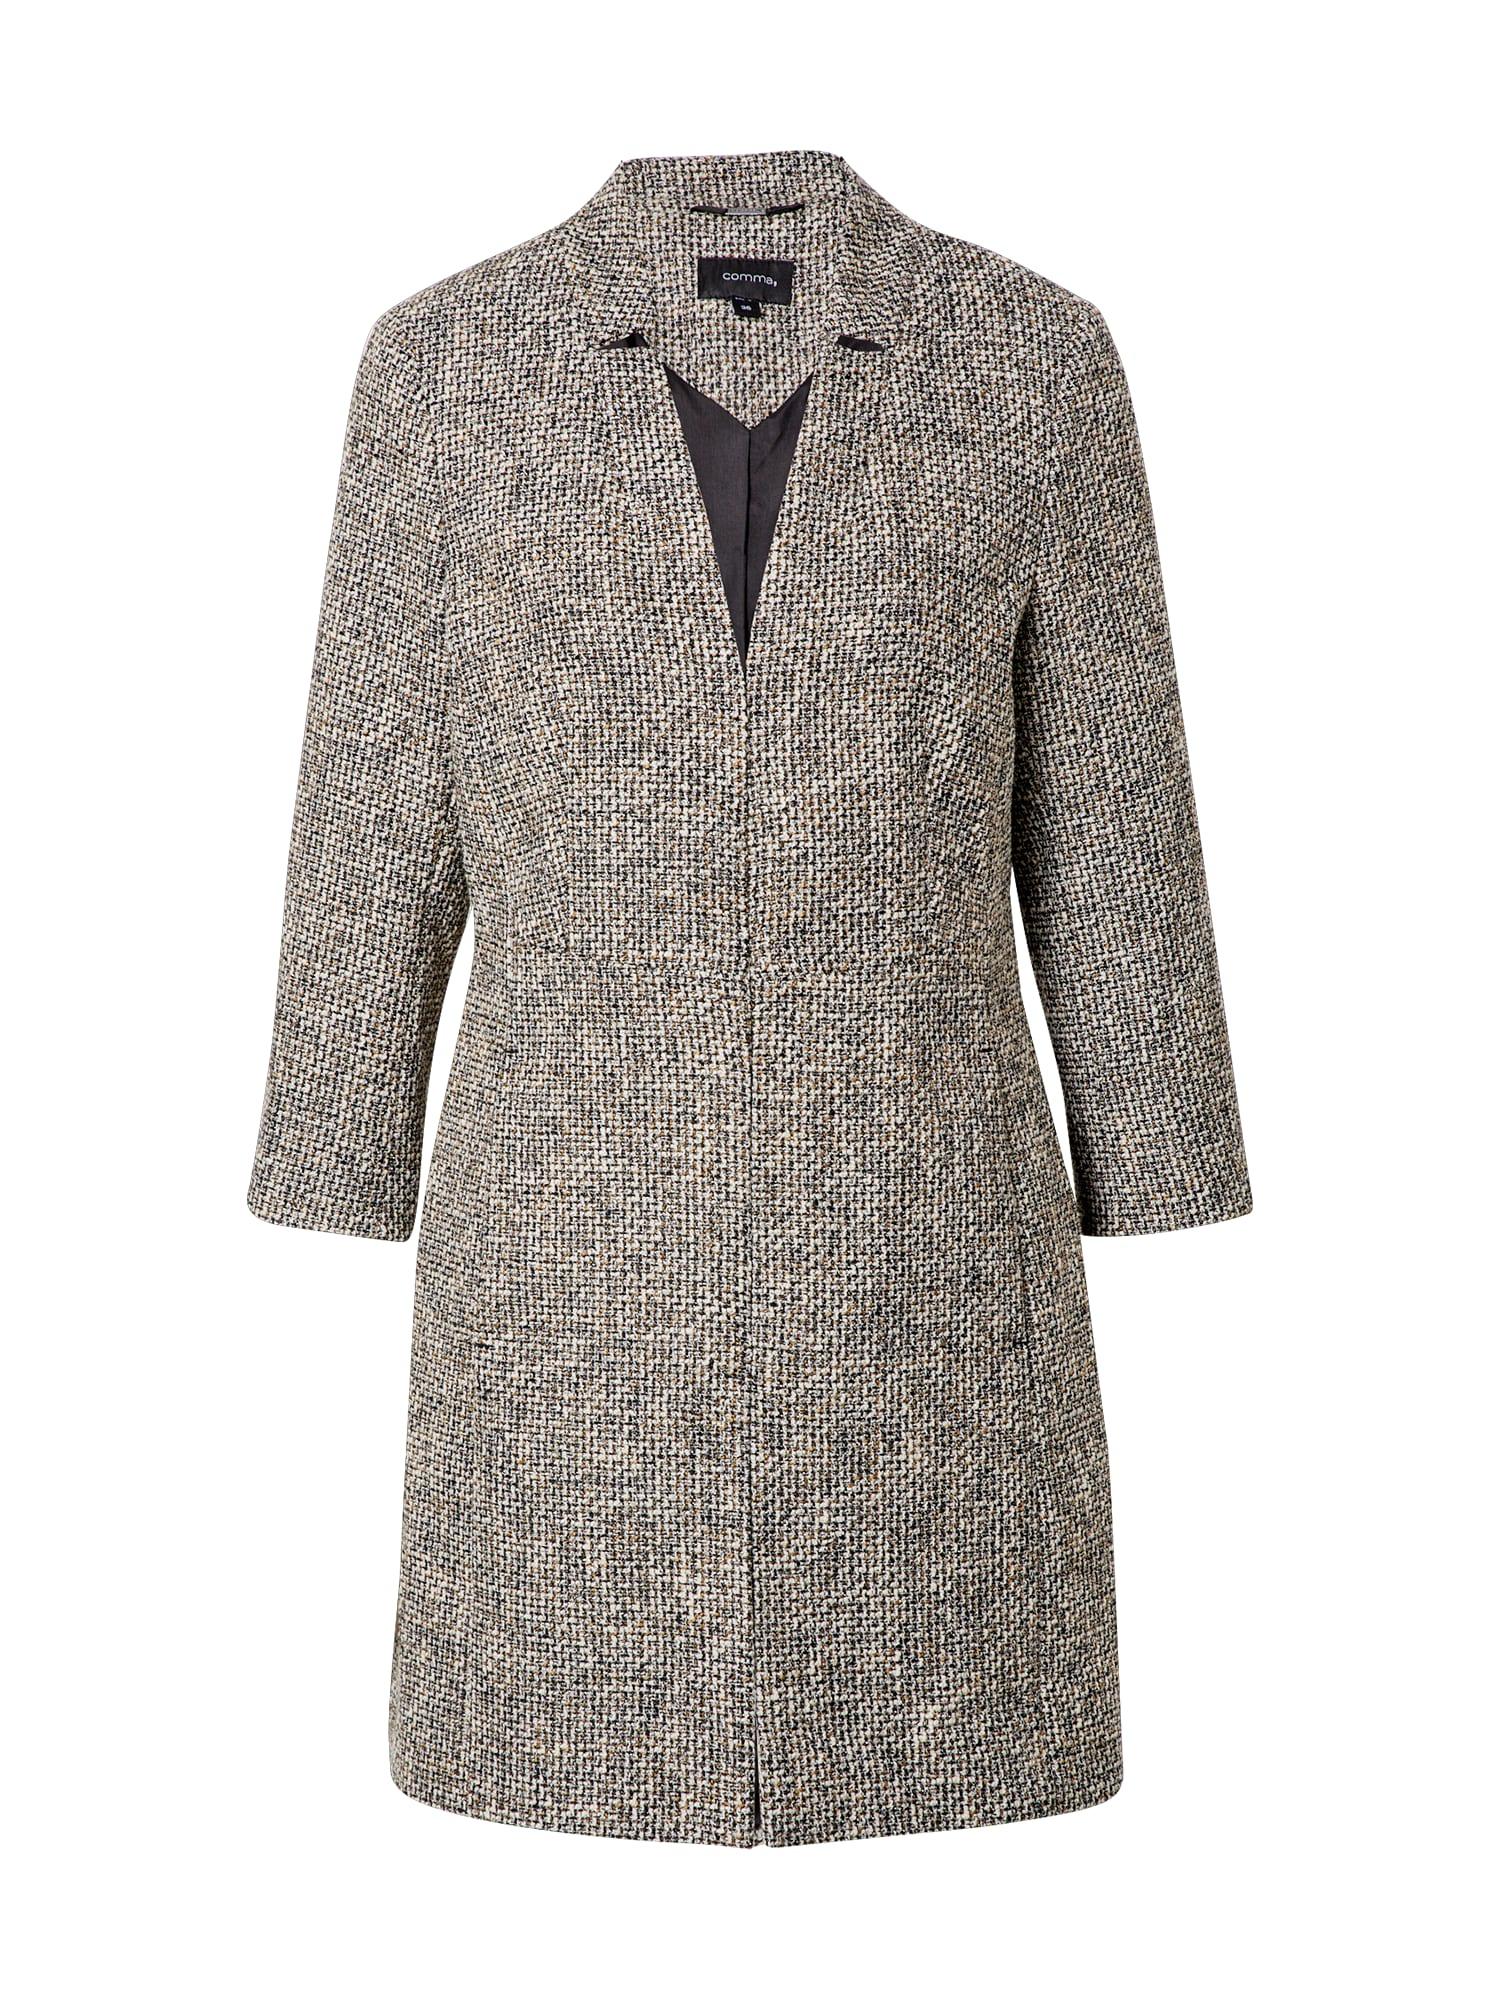 COMMA Demisezoninis paltas margai pilka